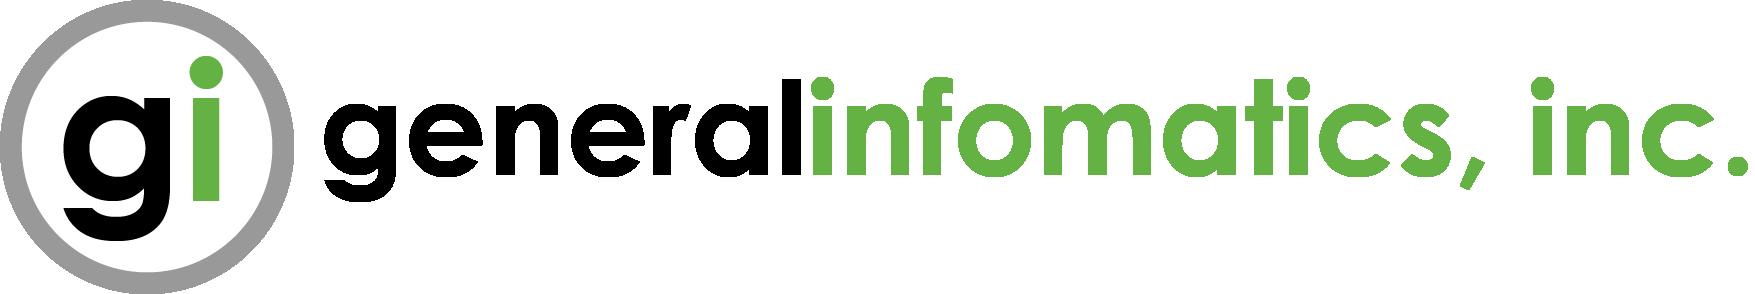 Copy of GeneraliInfomatics logo